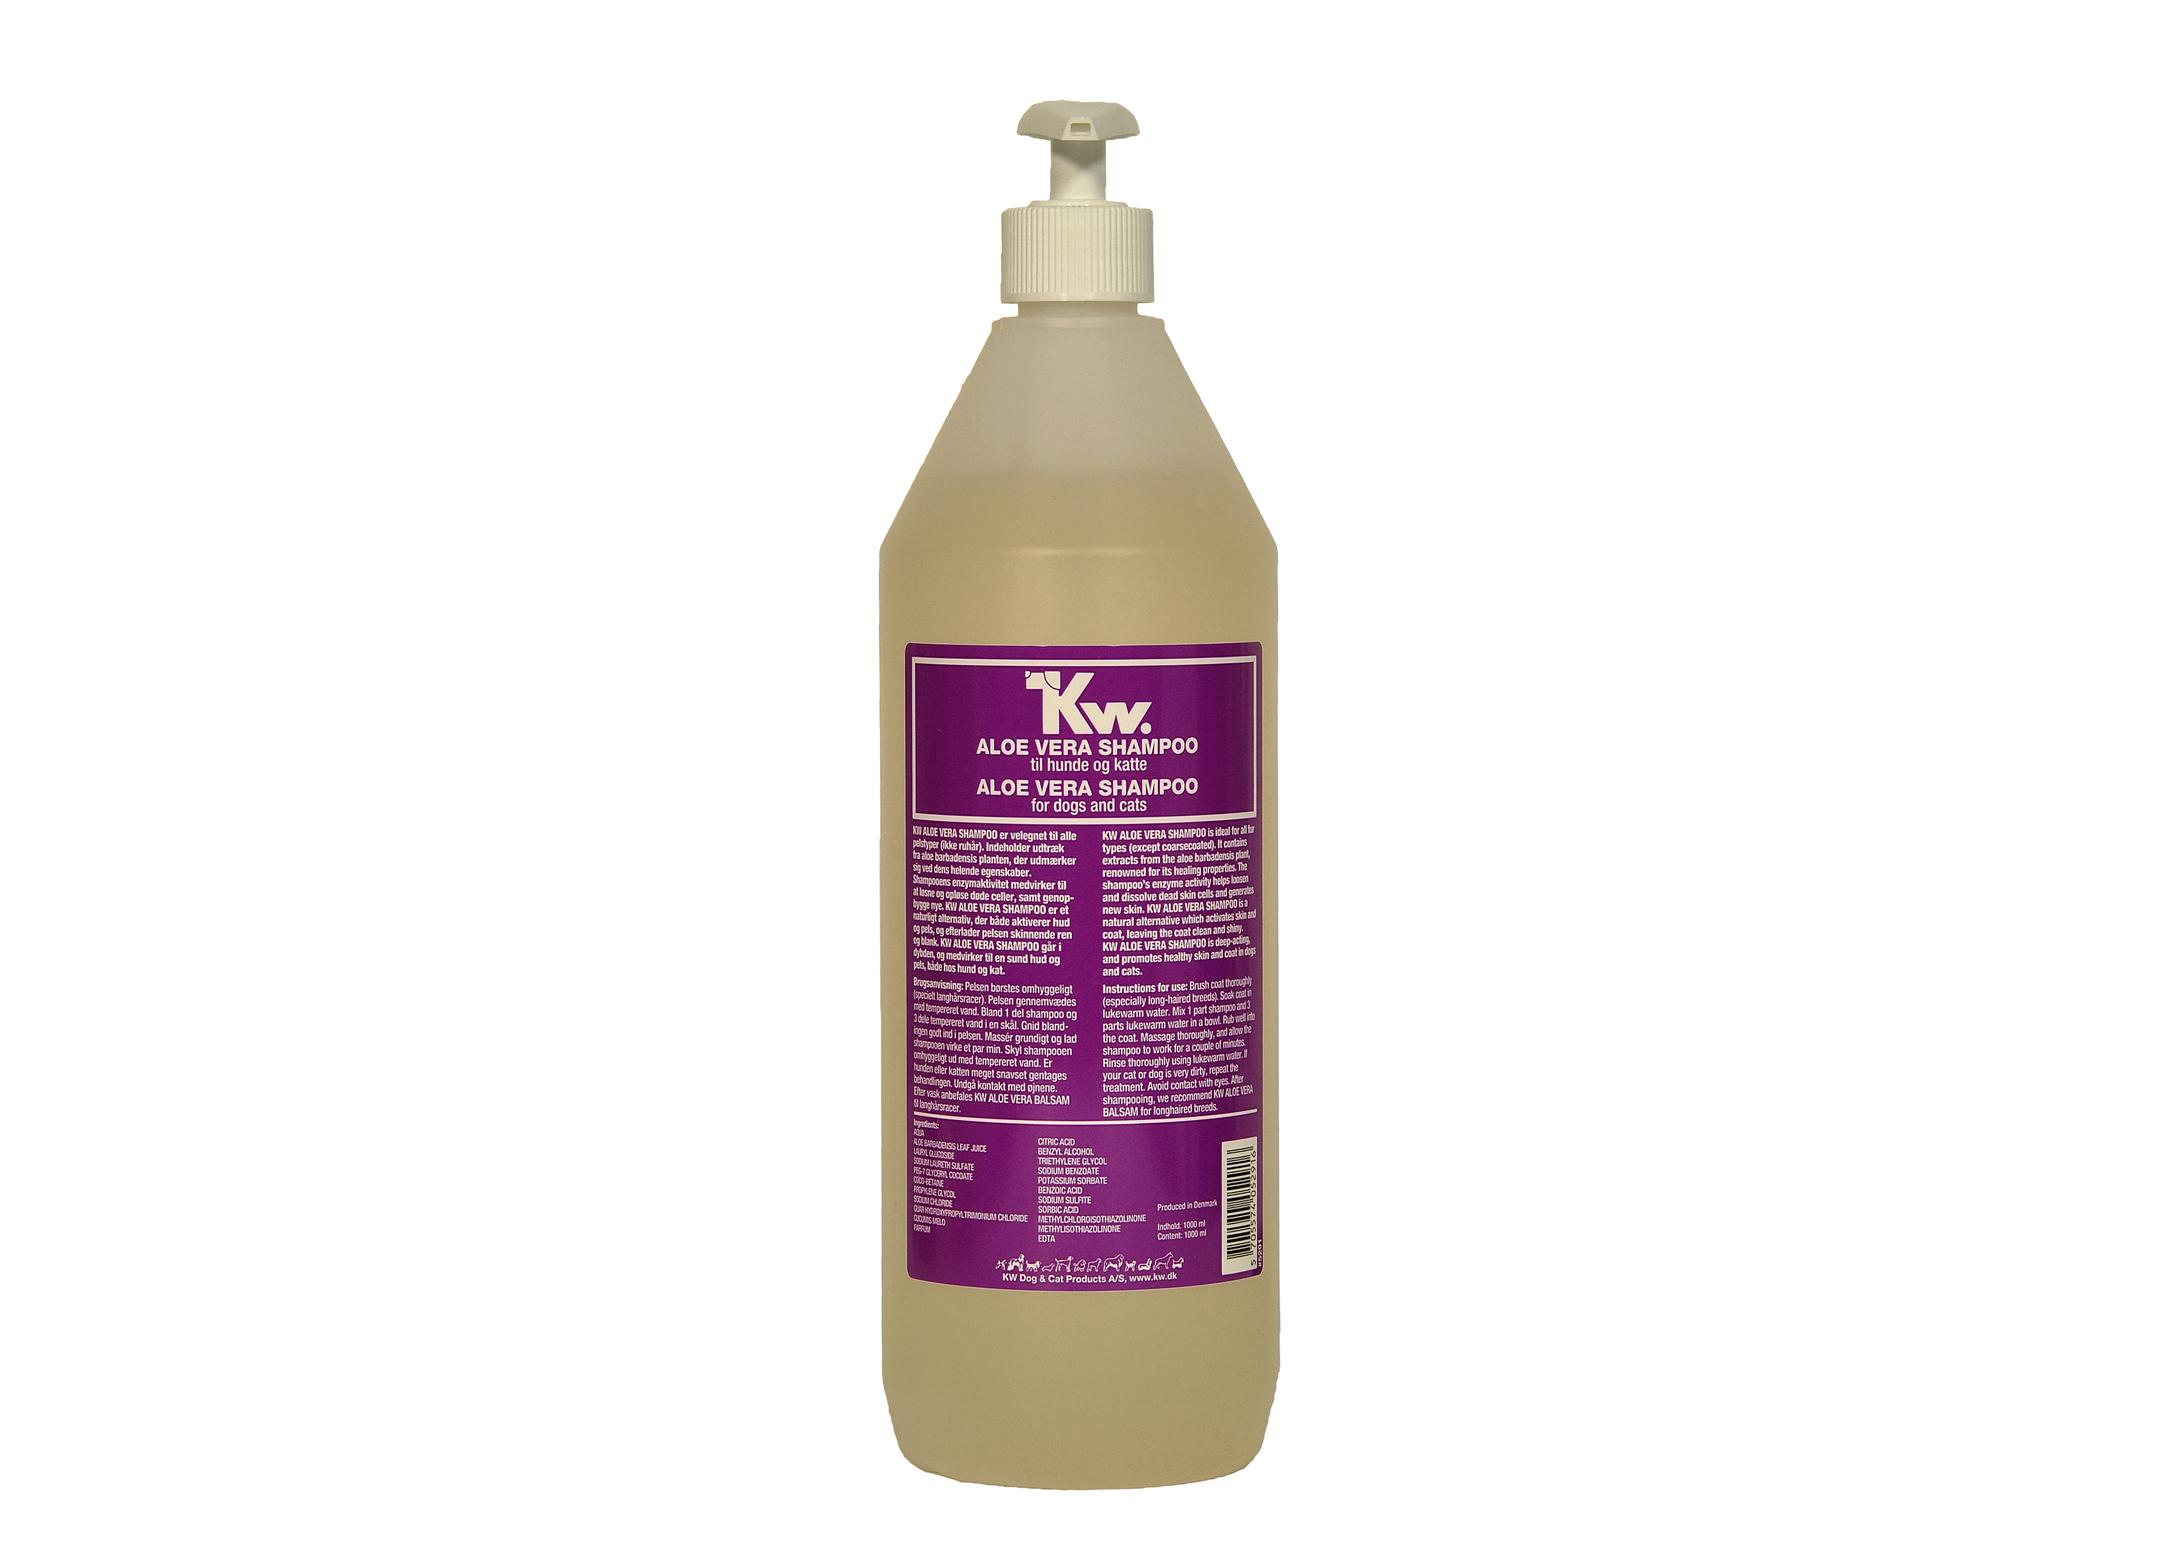 KW Aloe Vera Shampooing 1L